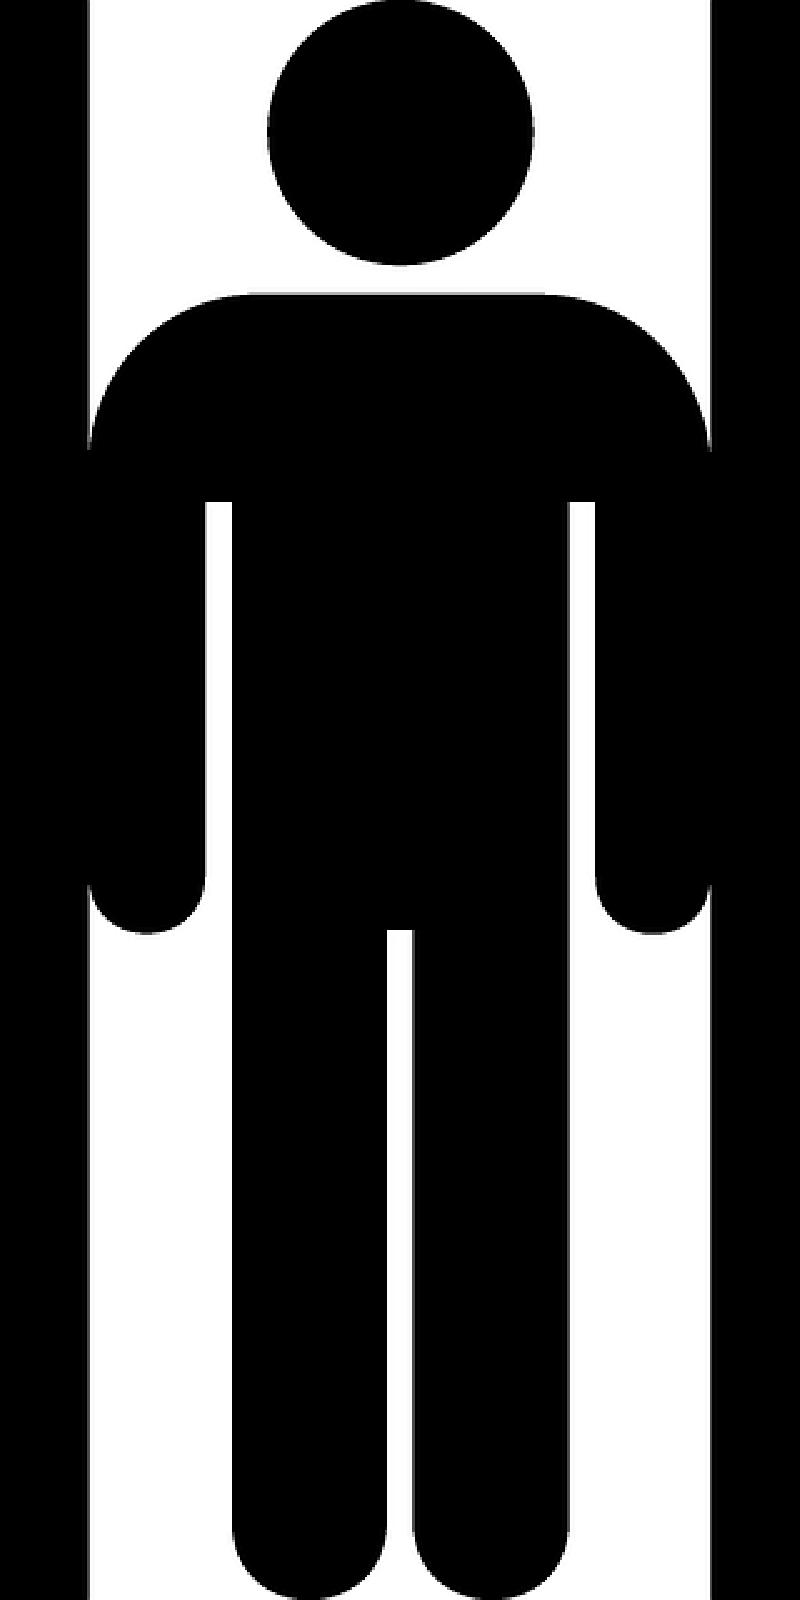 800x1600 Sign, Silhouette, Male, Toilet, Public, Bathroom Public, Man